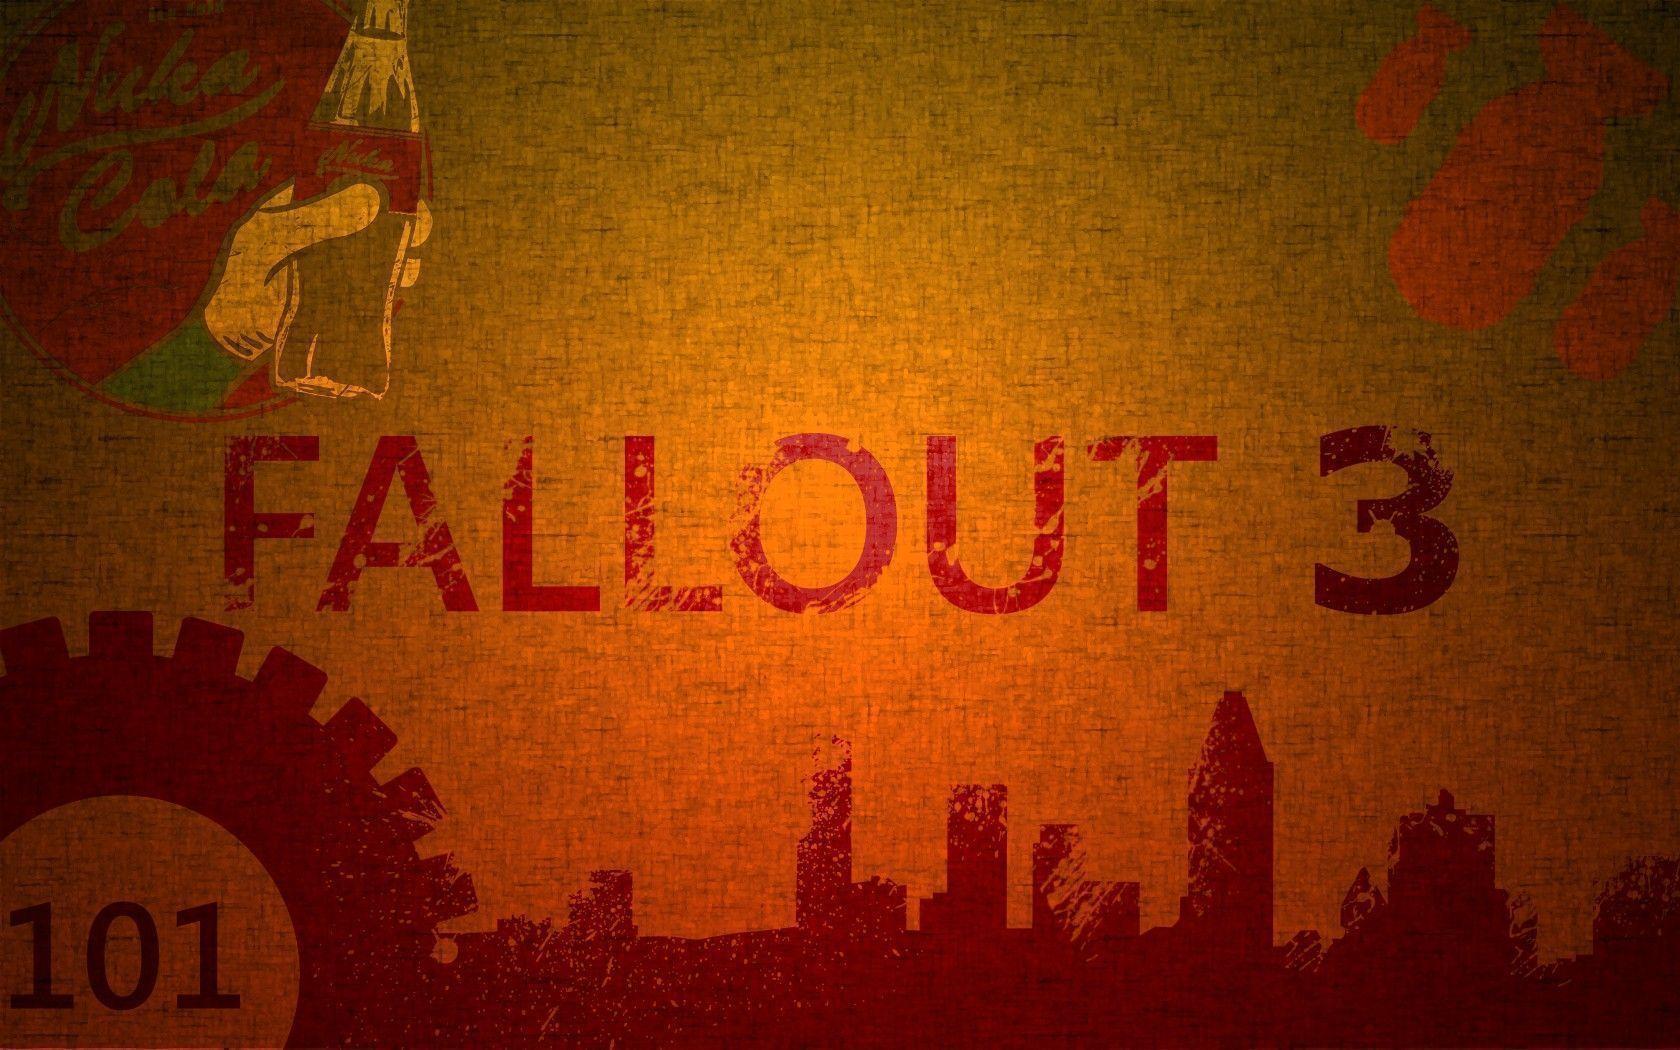 Download Fallout Nuka Wallpaper 1680x1050